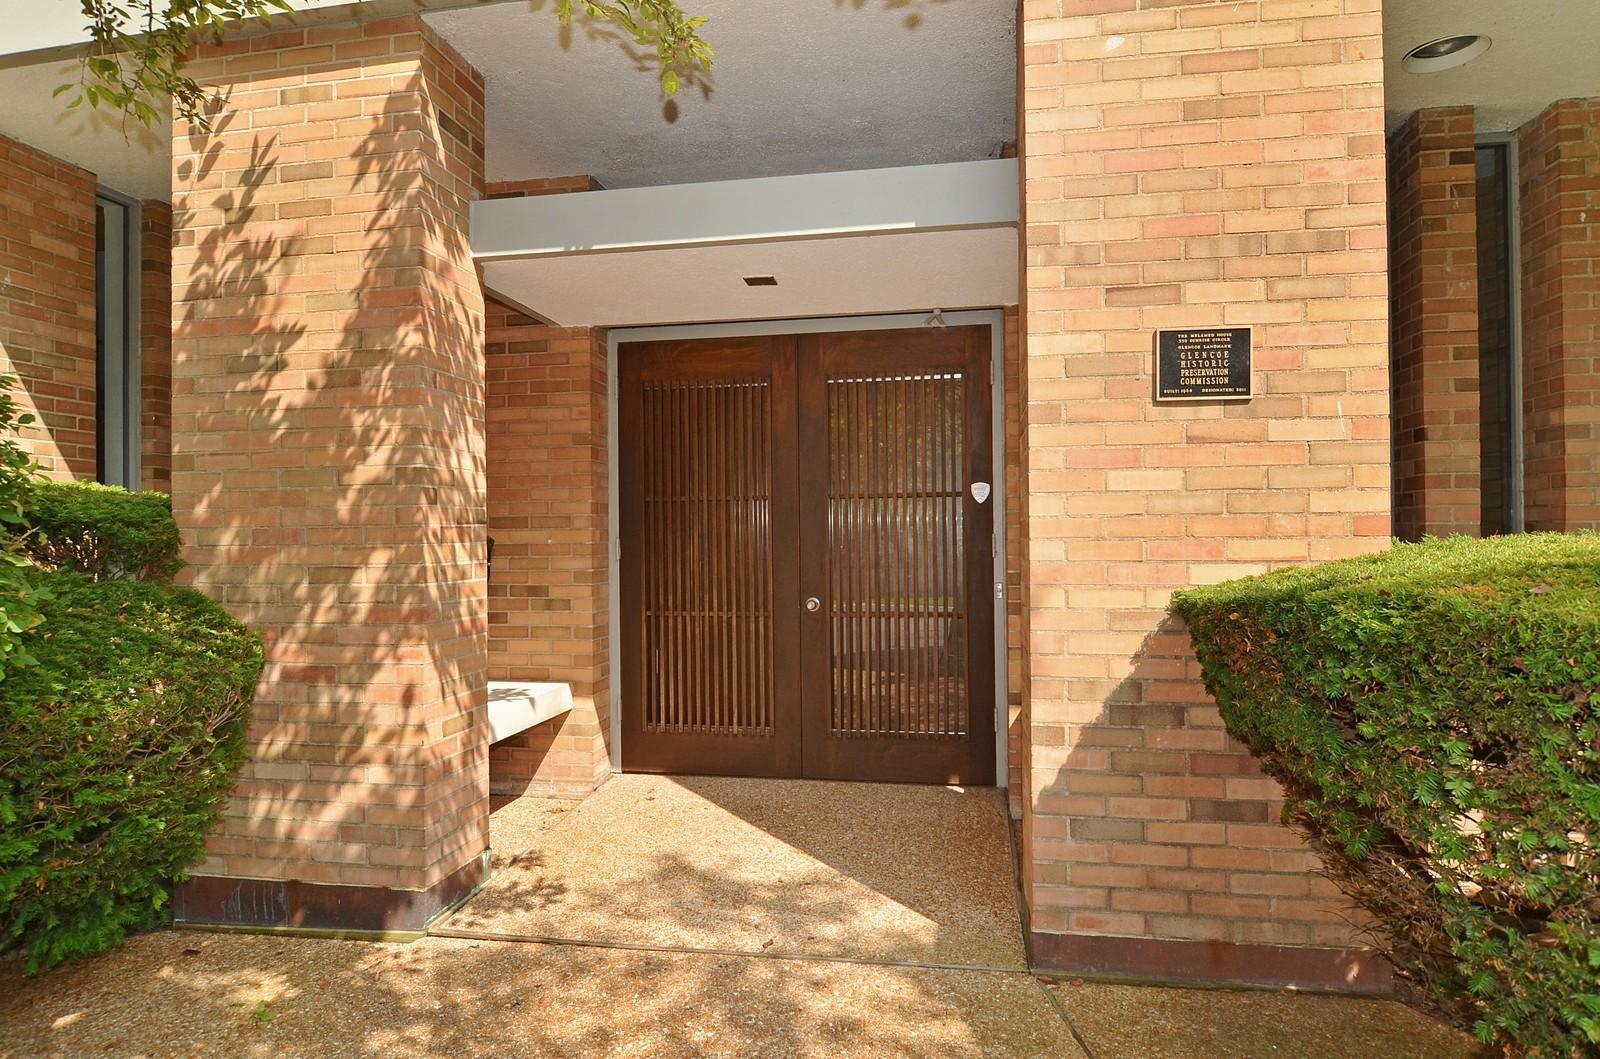 Real Estate Photography - 350 Sunrise Circle, Glencoe, IL, 60022 - Landmark Certification Plaque